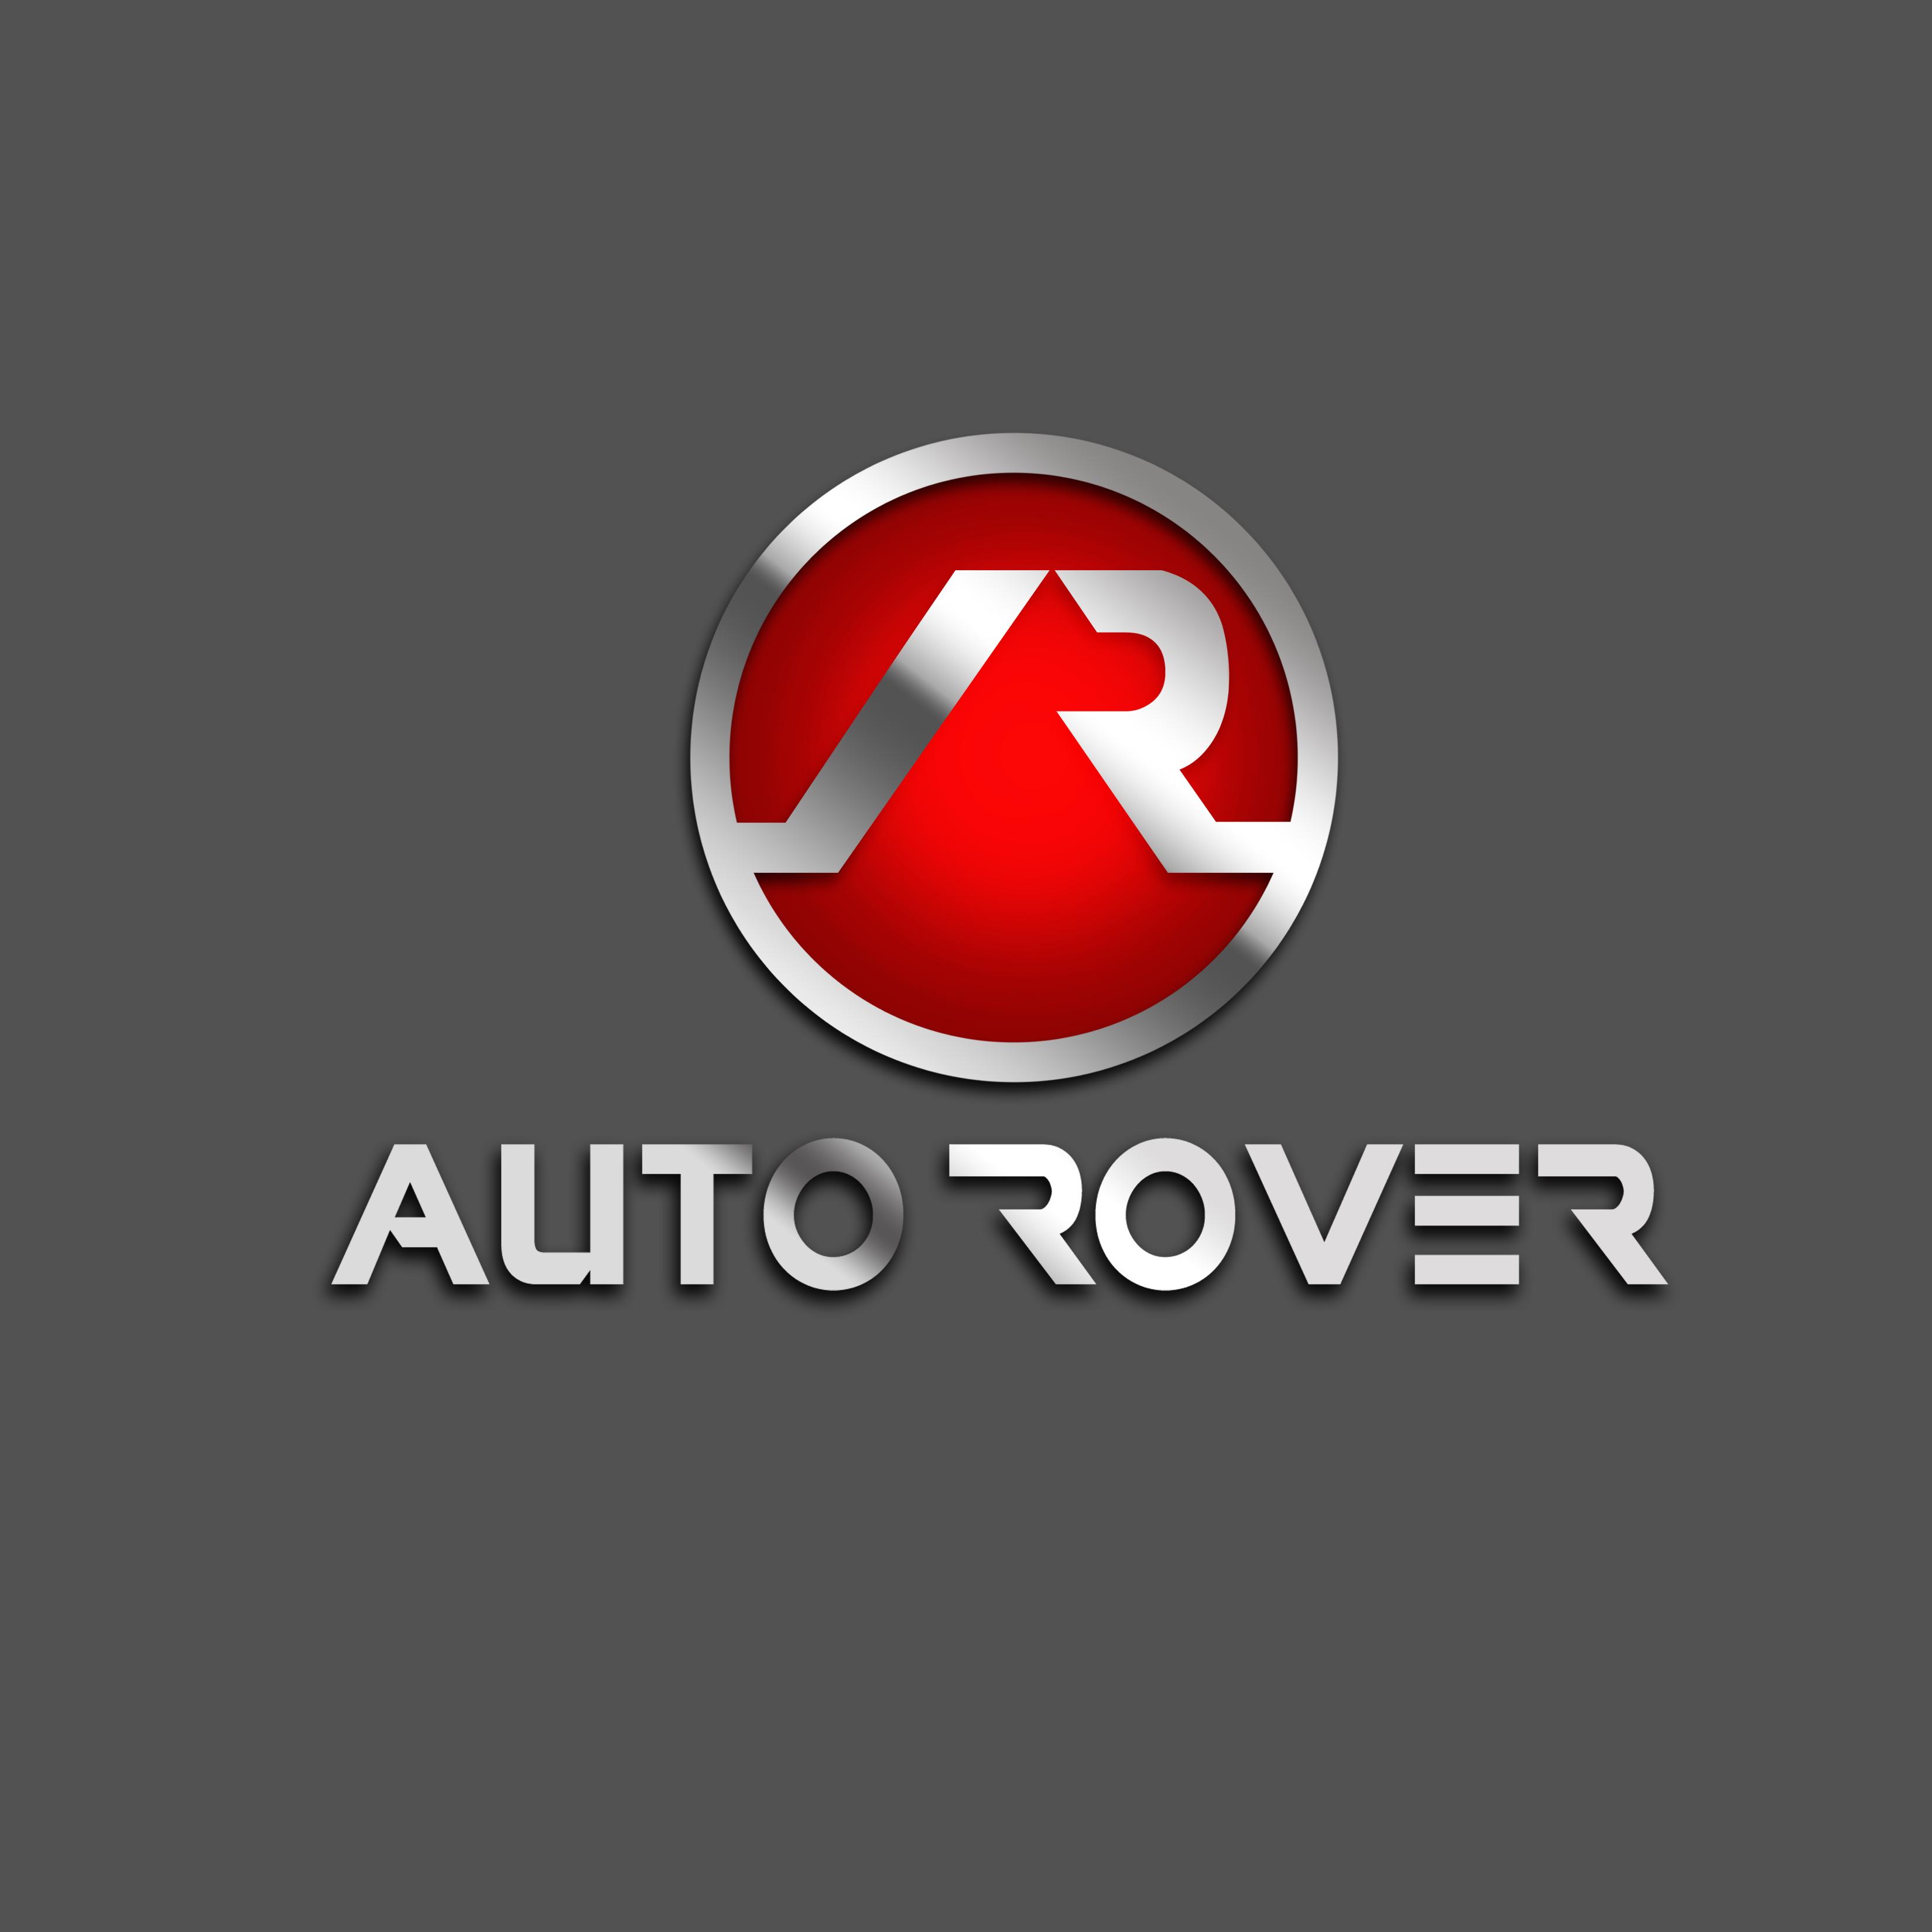 Logo Design by Allan Esclamado - Entry No. 14 in the Logo Design Contest Auto Rover Logo Design.